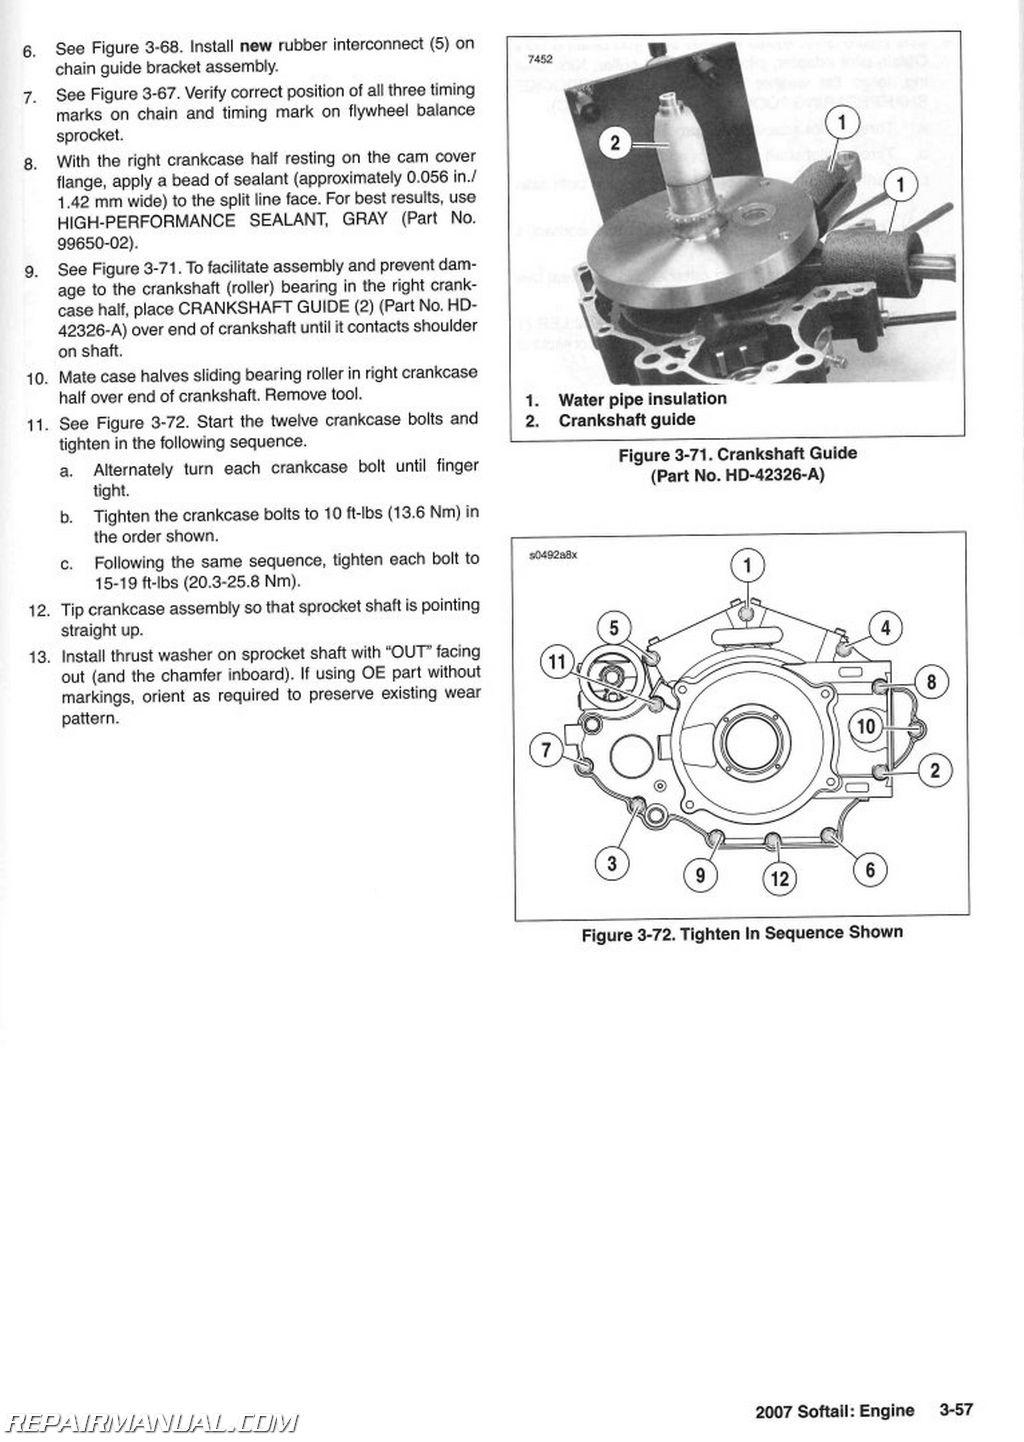 2007 harley davidson softail motorcycle service manual rh repairmanual com 2007 harley davidson flhx owners manual 2007 harley davidson sportster 883 owners manual pdf